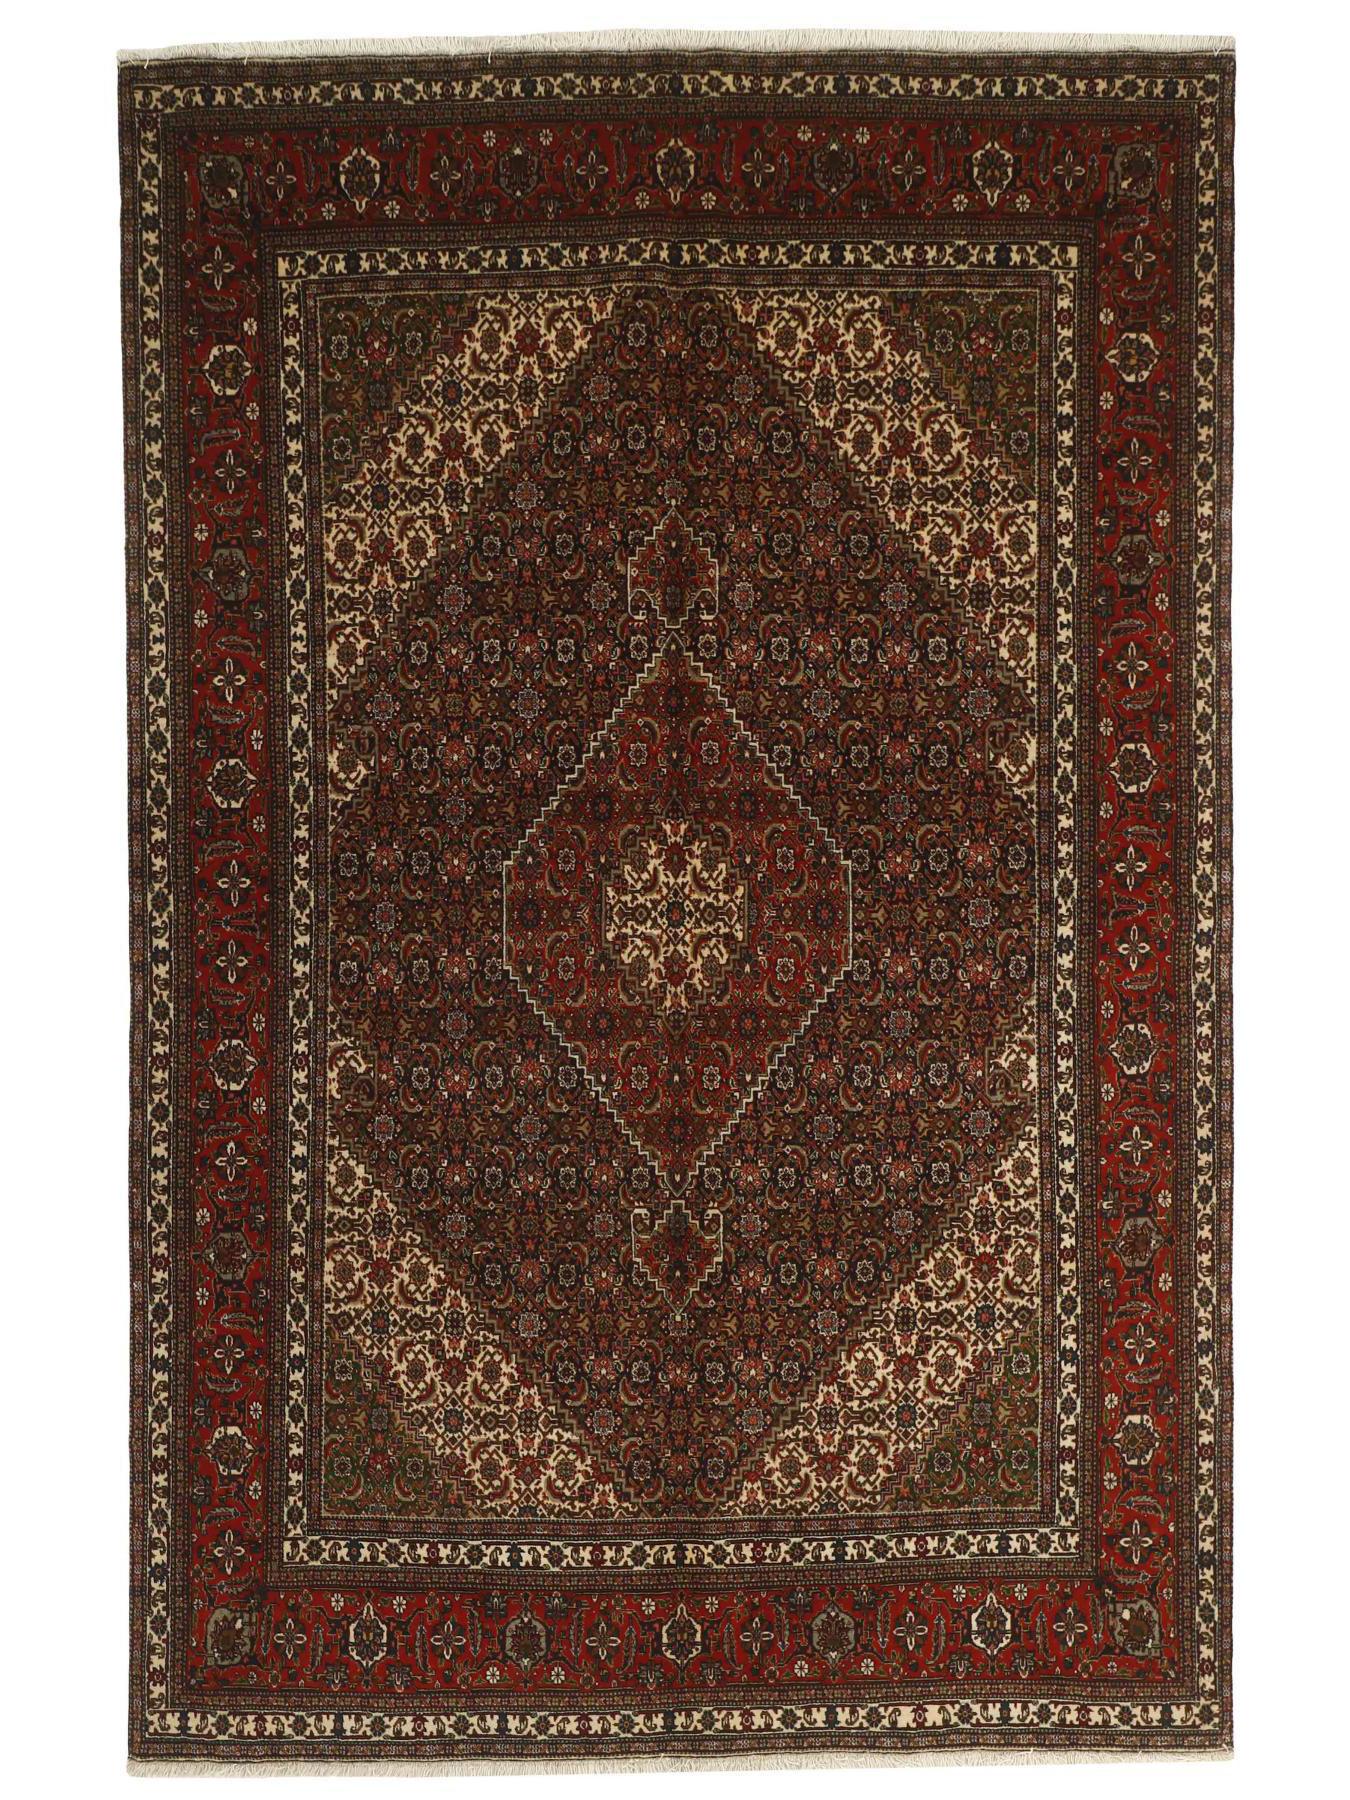 Tapis persans - Tabriz 40 Mahi